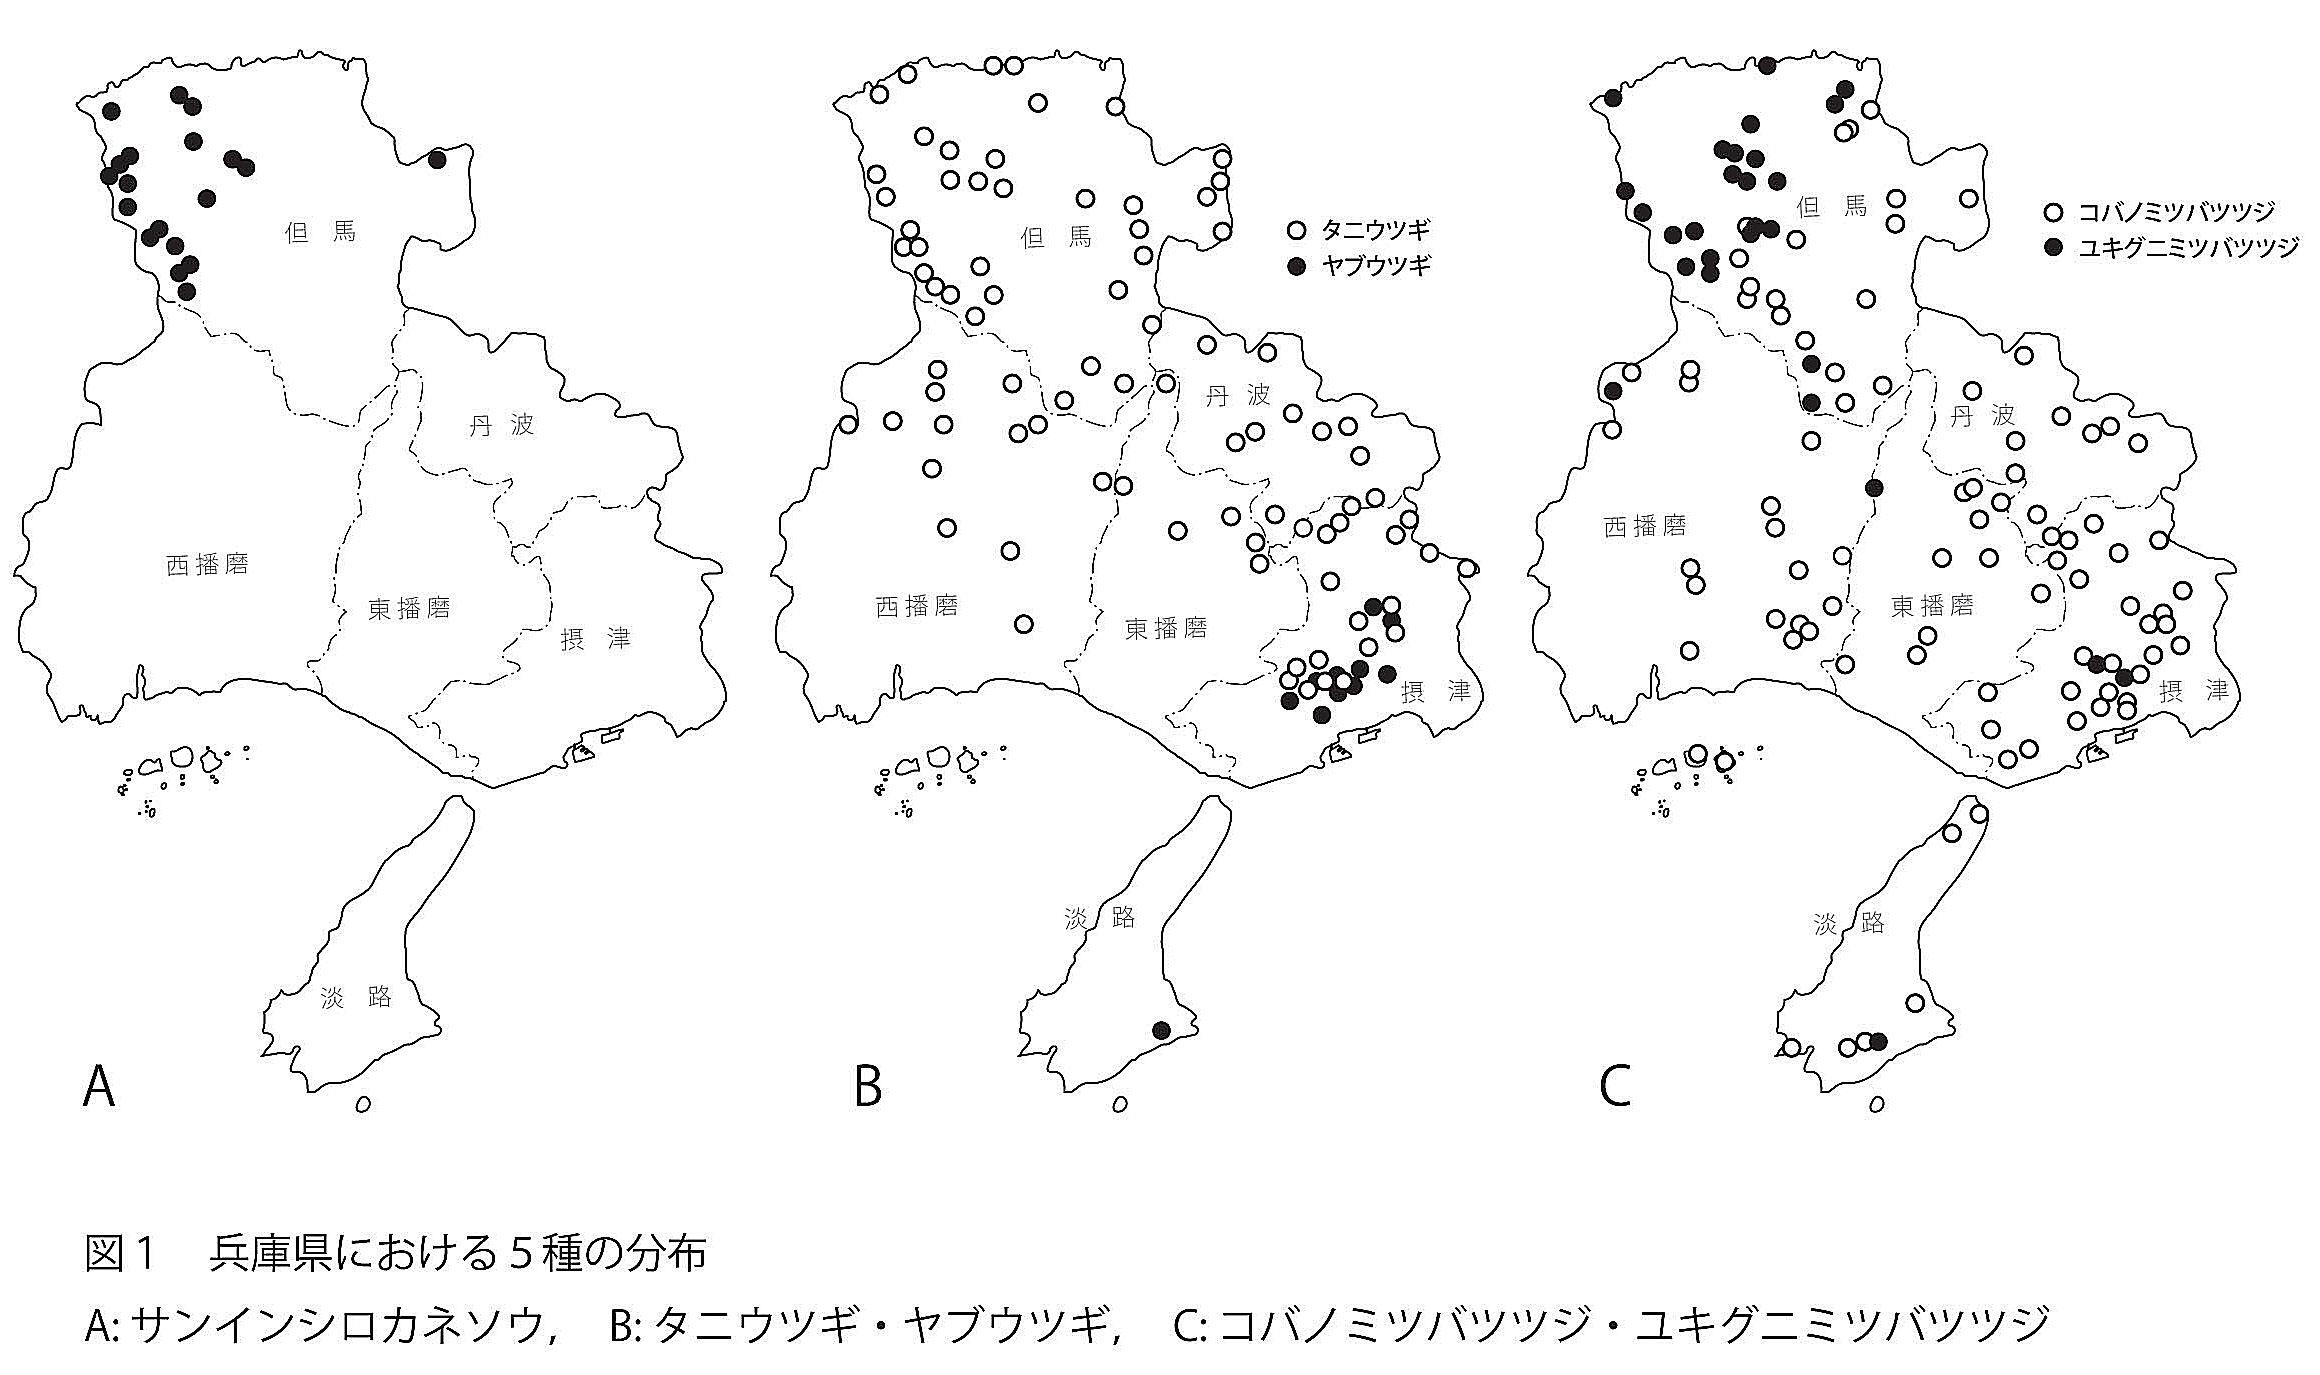 https://www.hitohaku.jp/publication/p-about/30thanniv-plantsofhyogo-fig1n.jpg